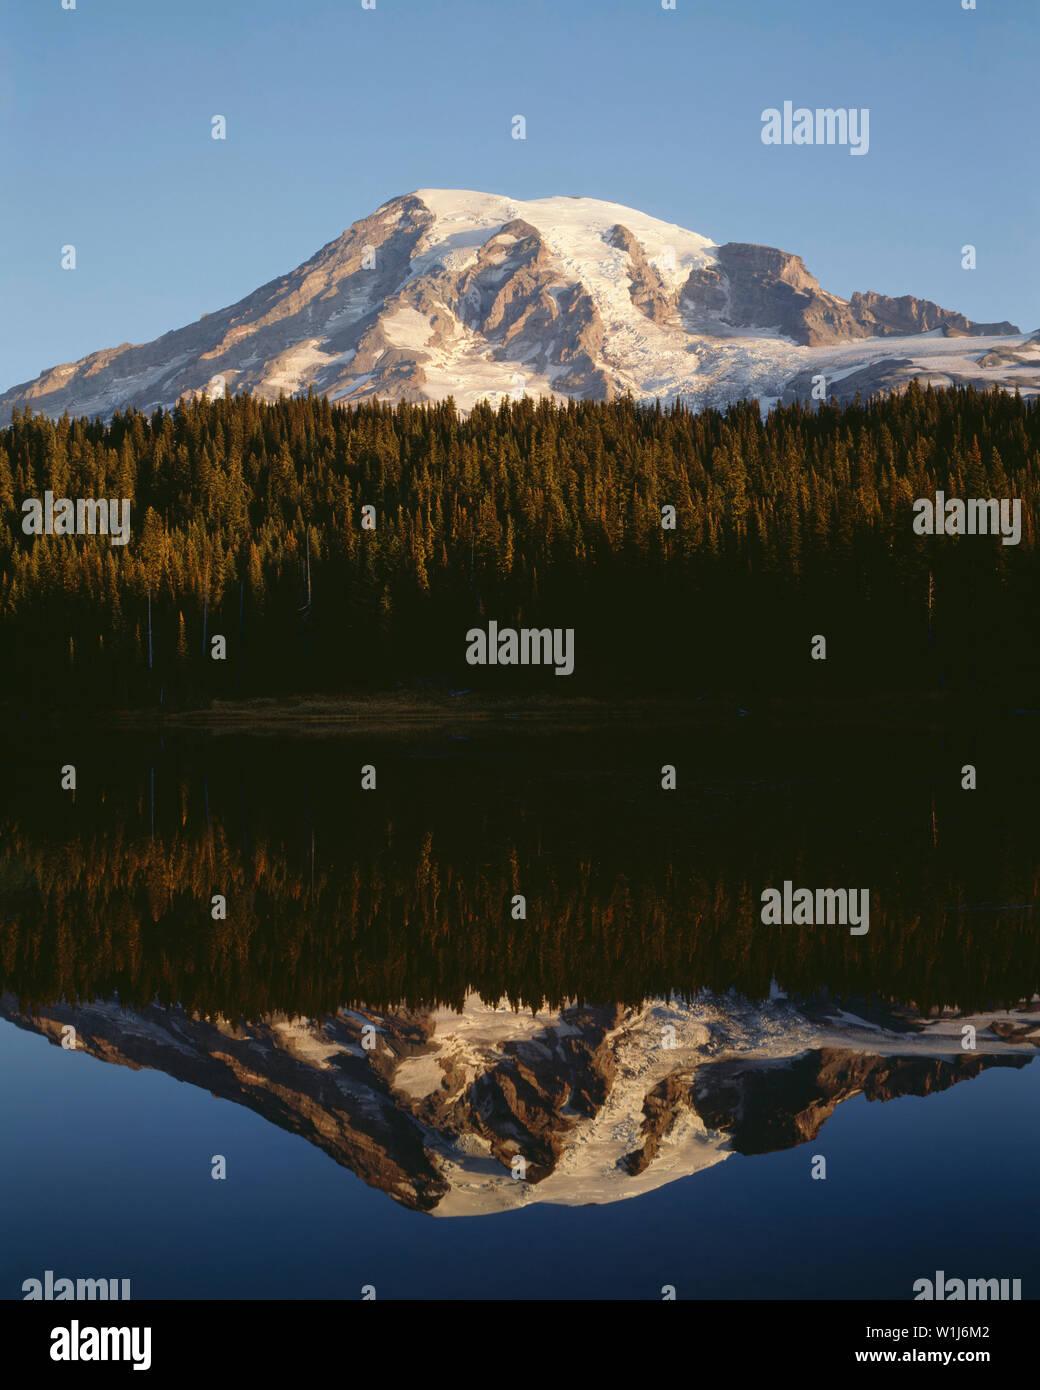 USA, Washington, Mt. Rainier National Park, Sunrise light on Mount Rainier is mirrored in Reflection Lake. - Stock Image